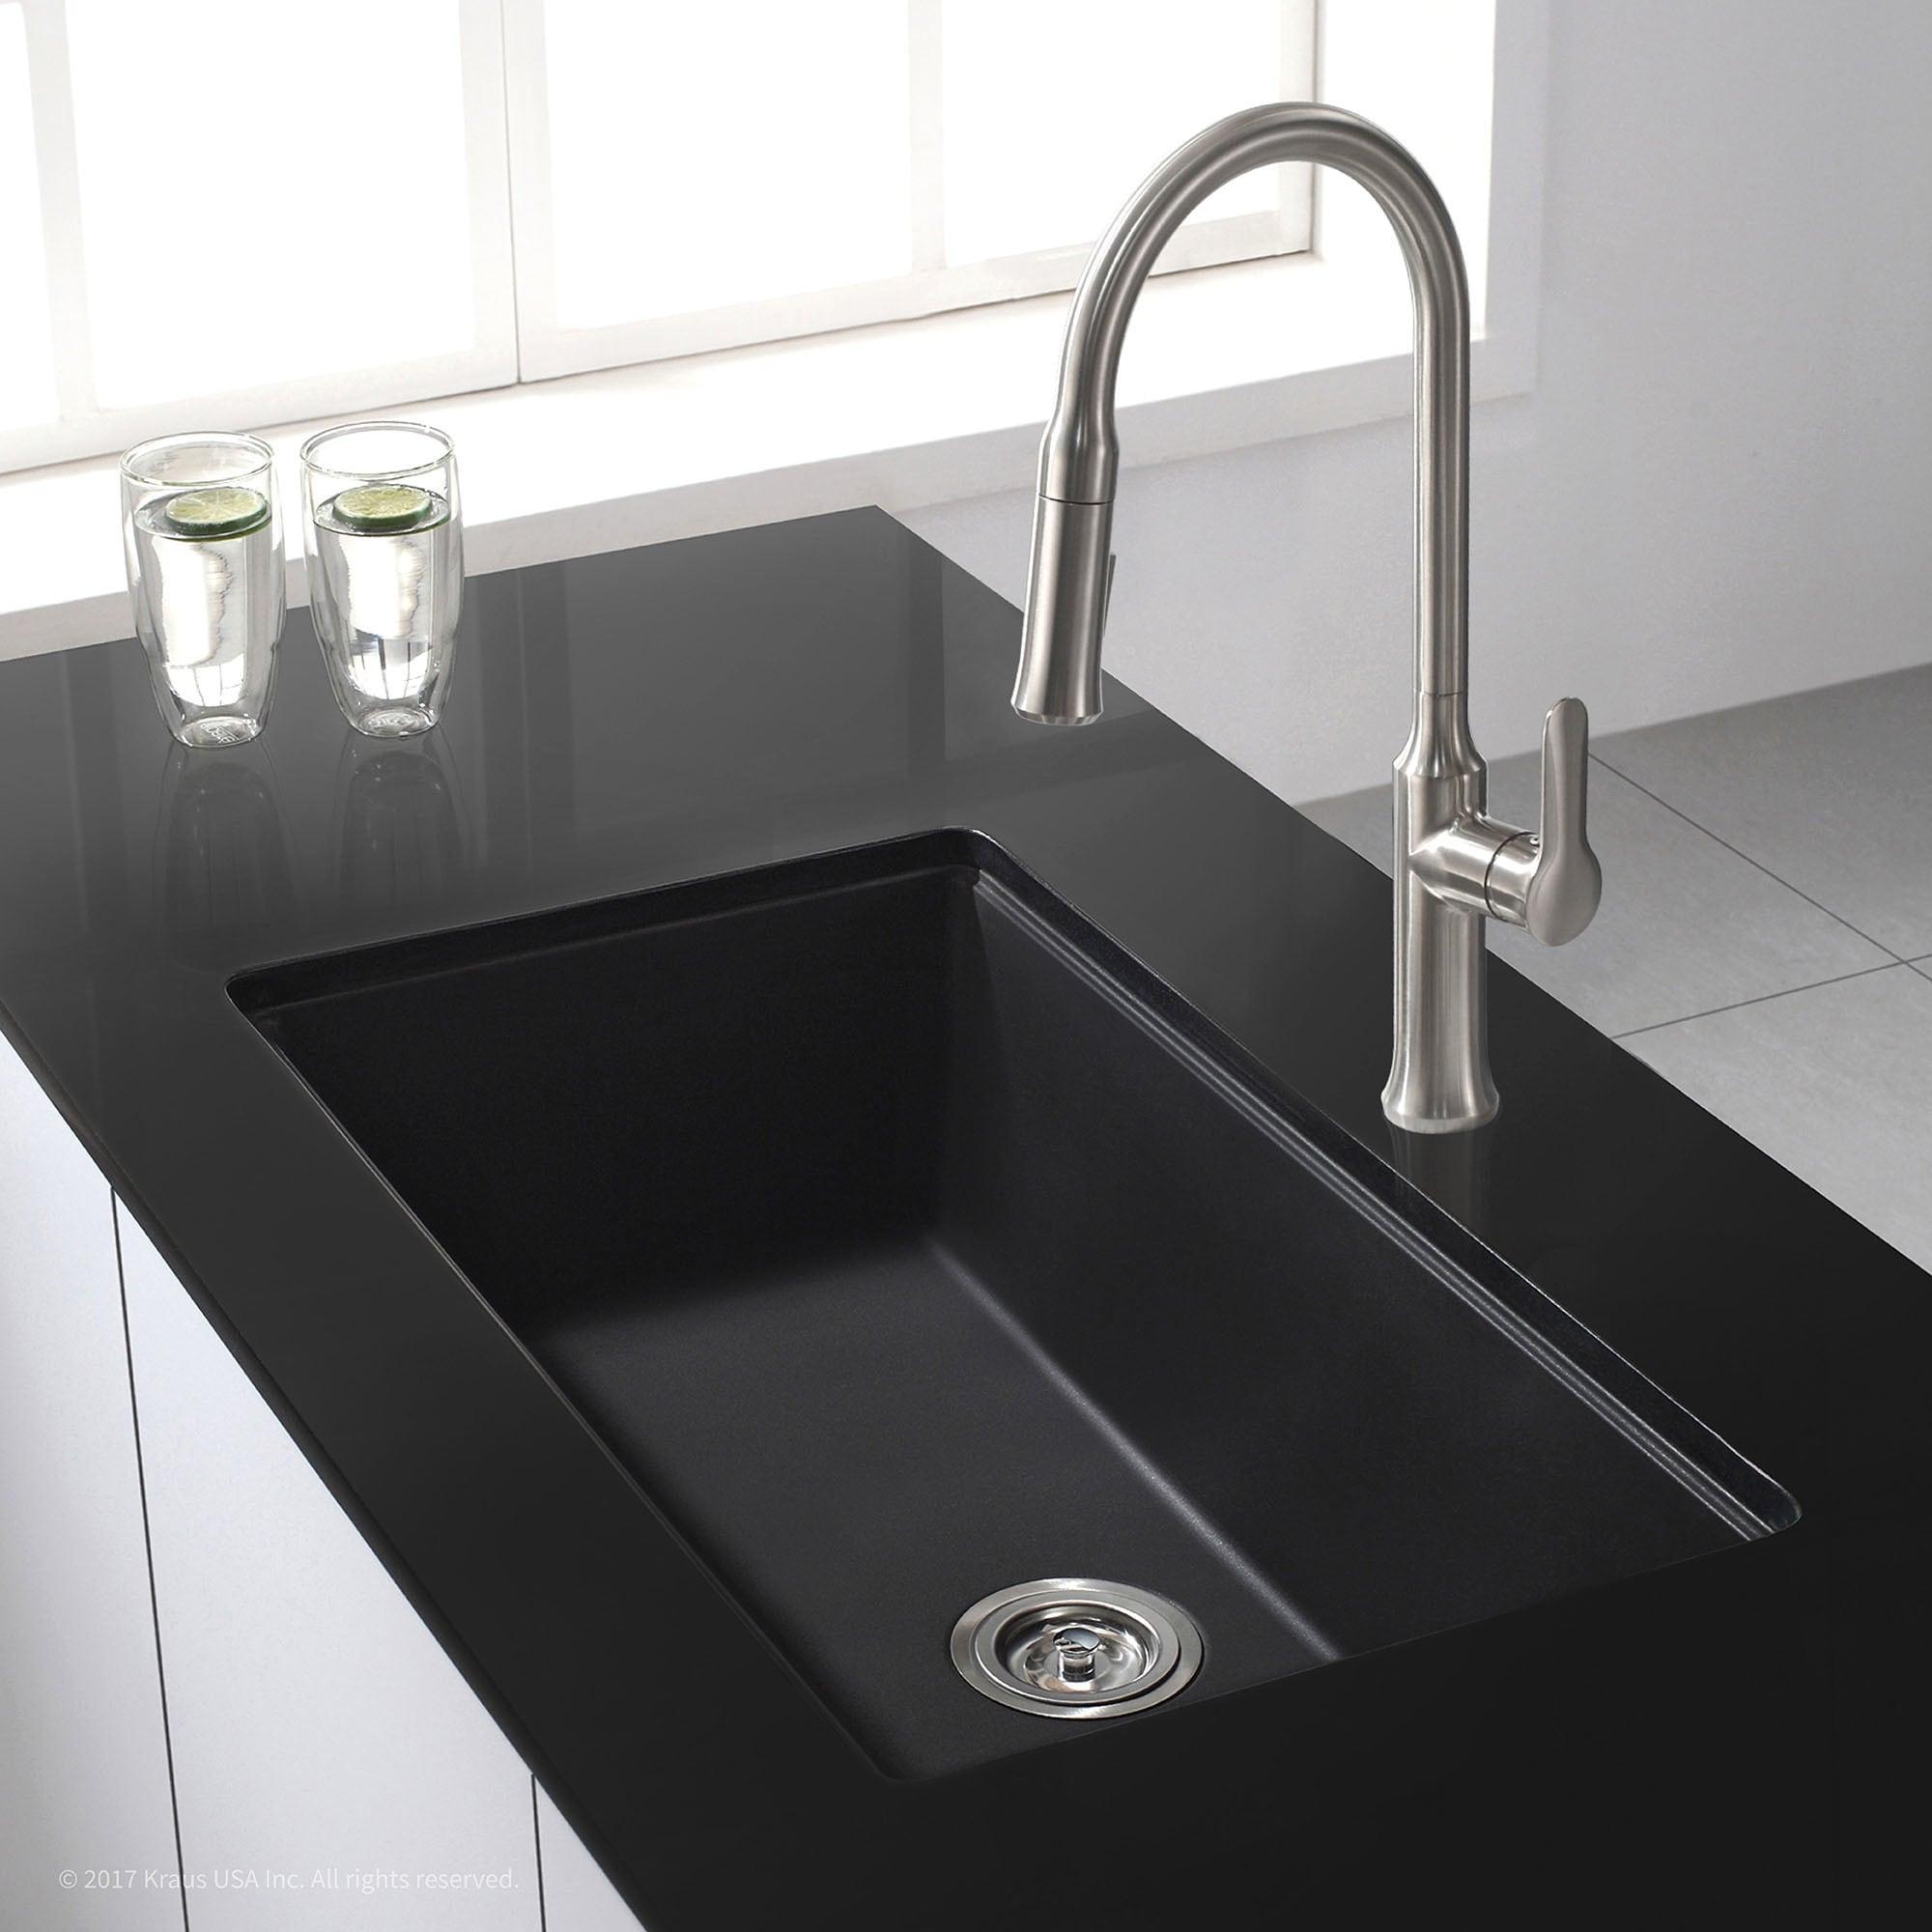 Kraus 31 inch undermount single bowl black onyx granite kitchen sink kraus 31 inch undermount single bowl black onyx granite kitchen sink free shipping today overstock 16073796 workwithnaturefo